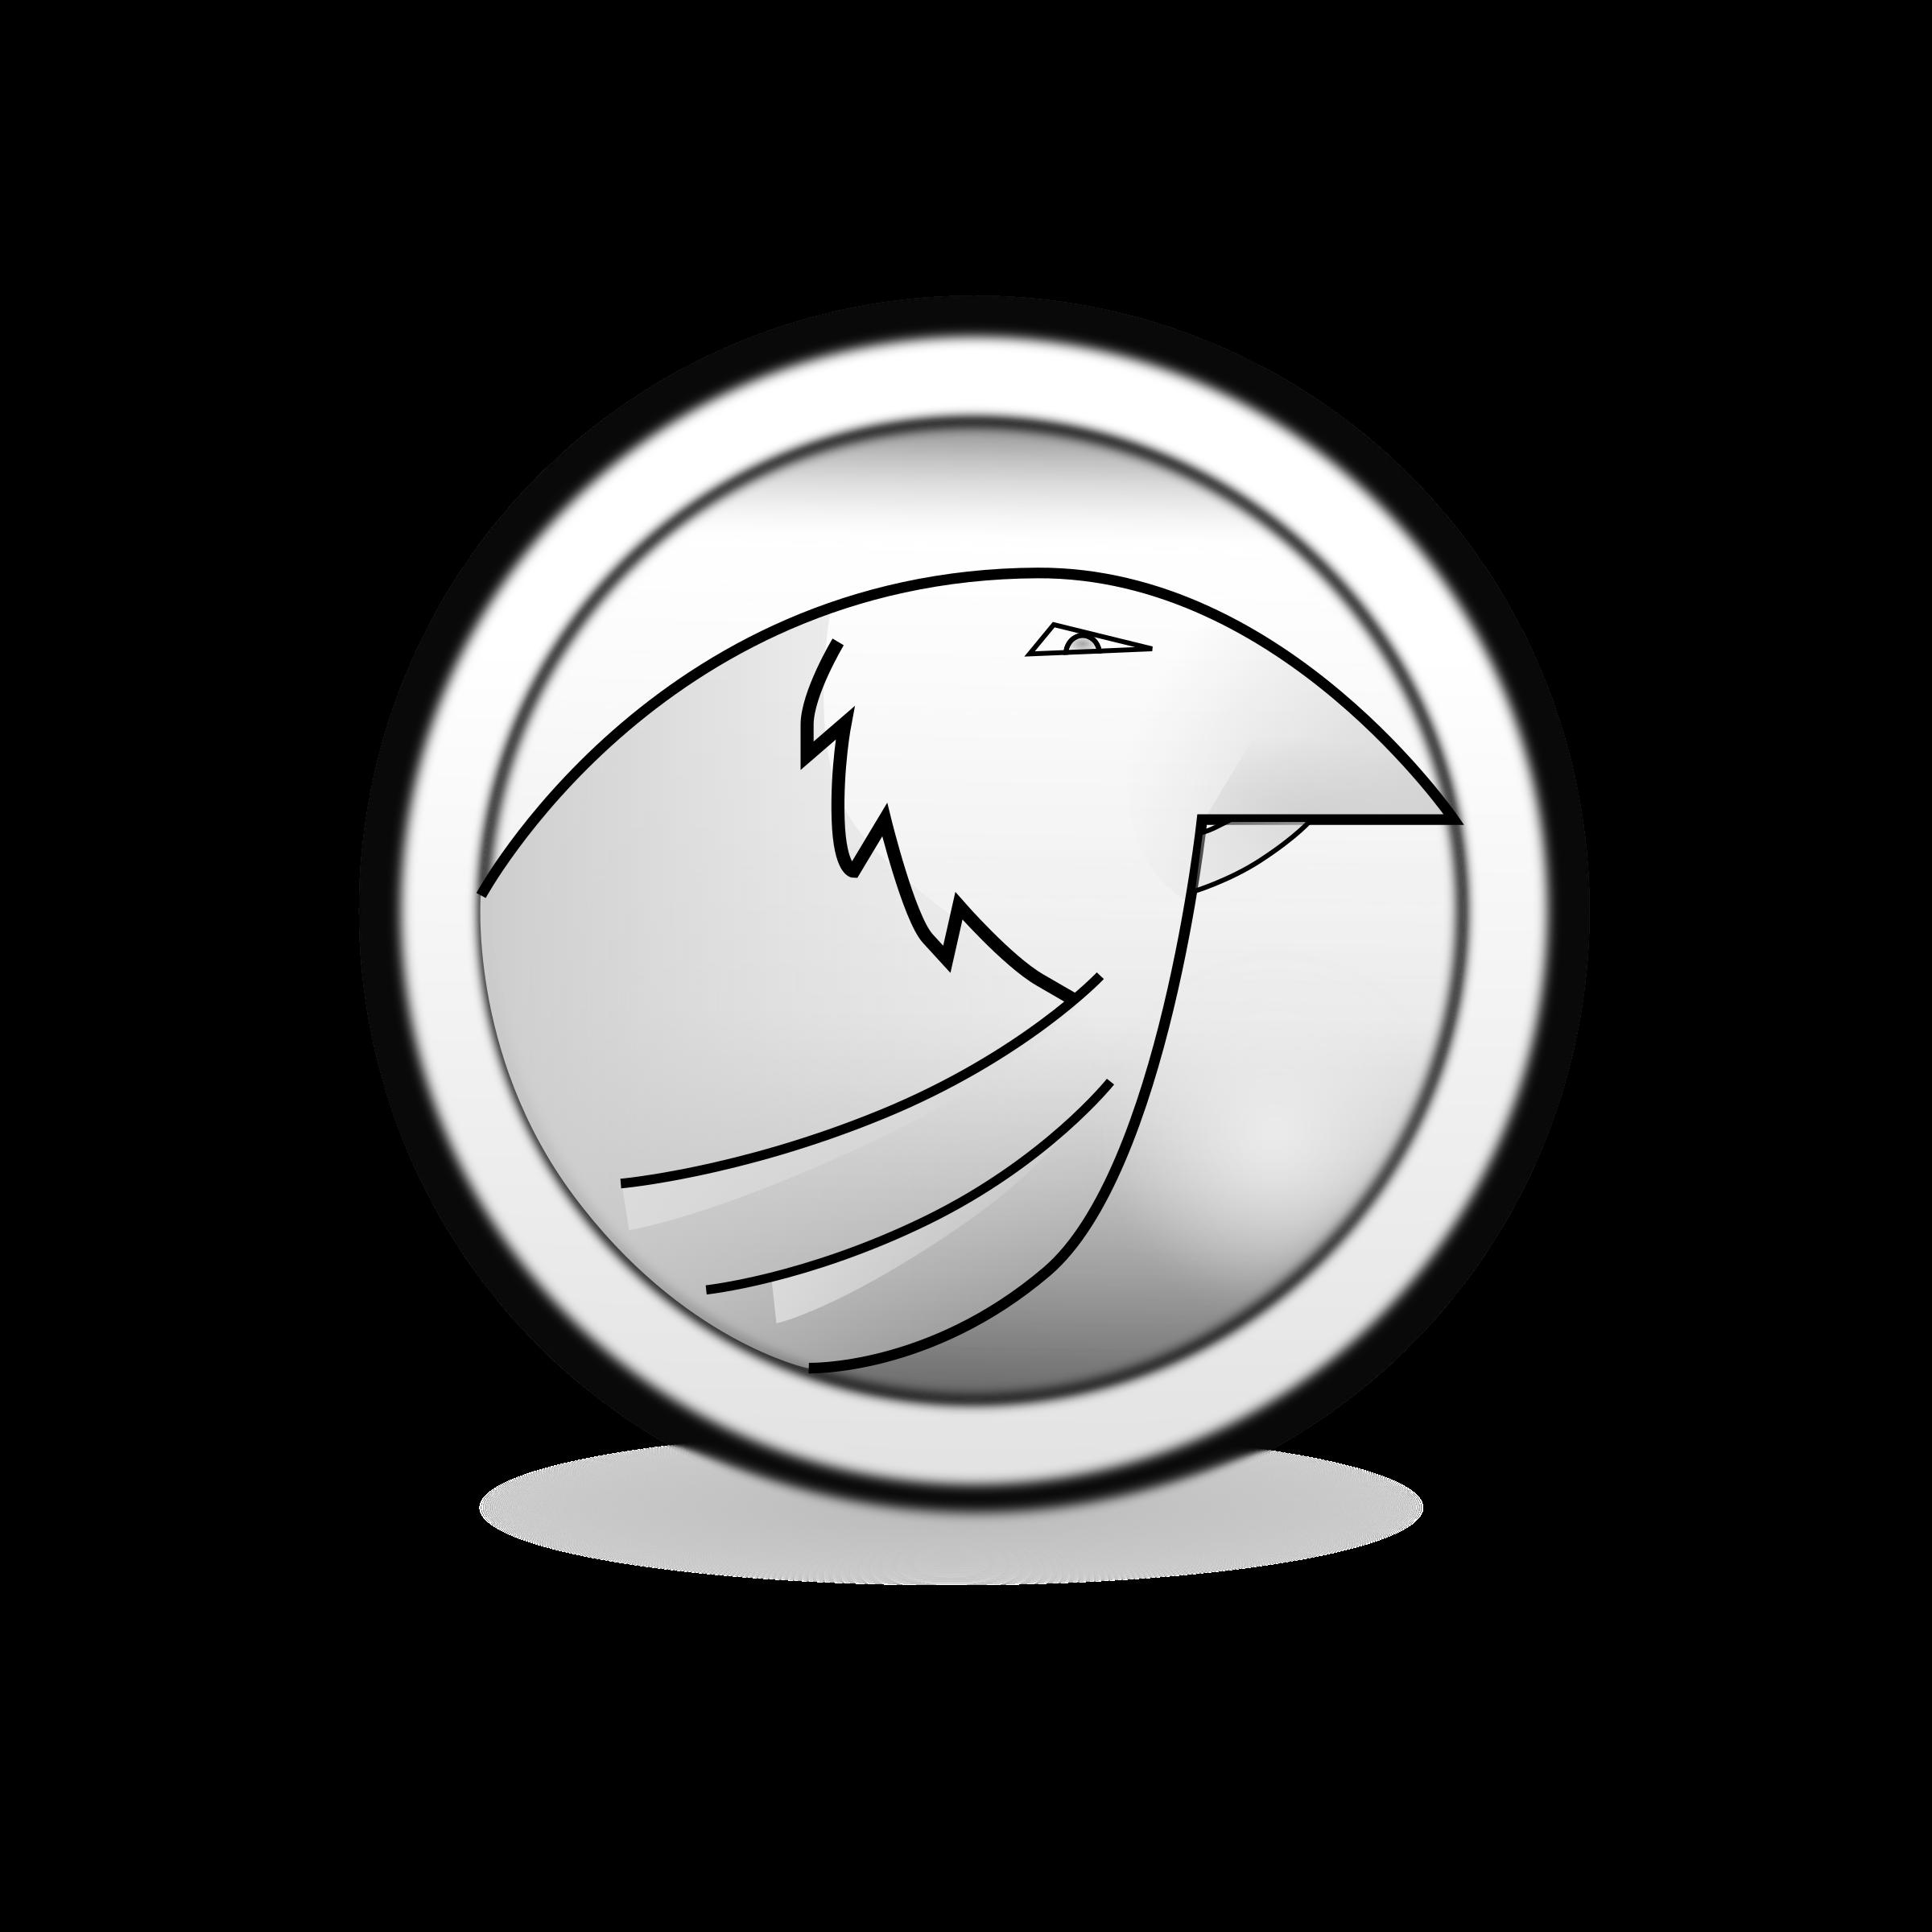 Eagle clipart cheerleader. Logo animal free black